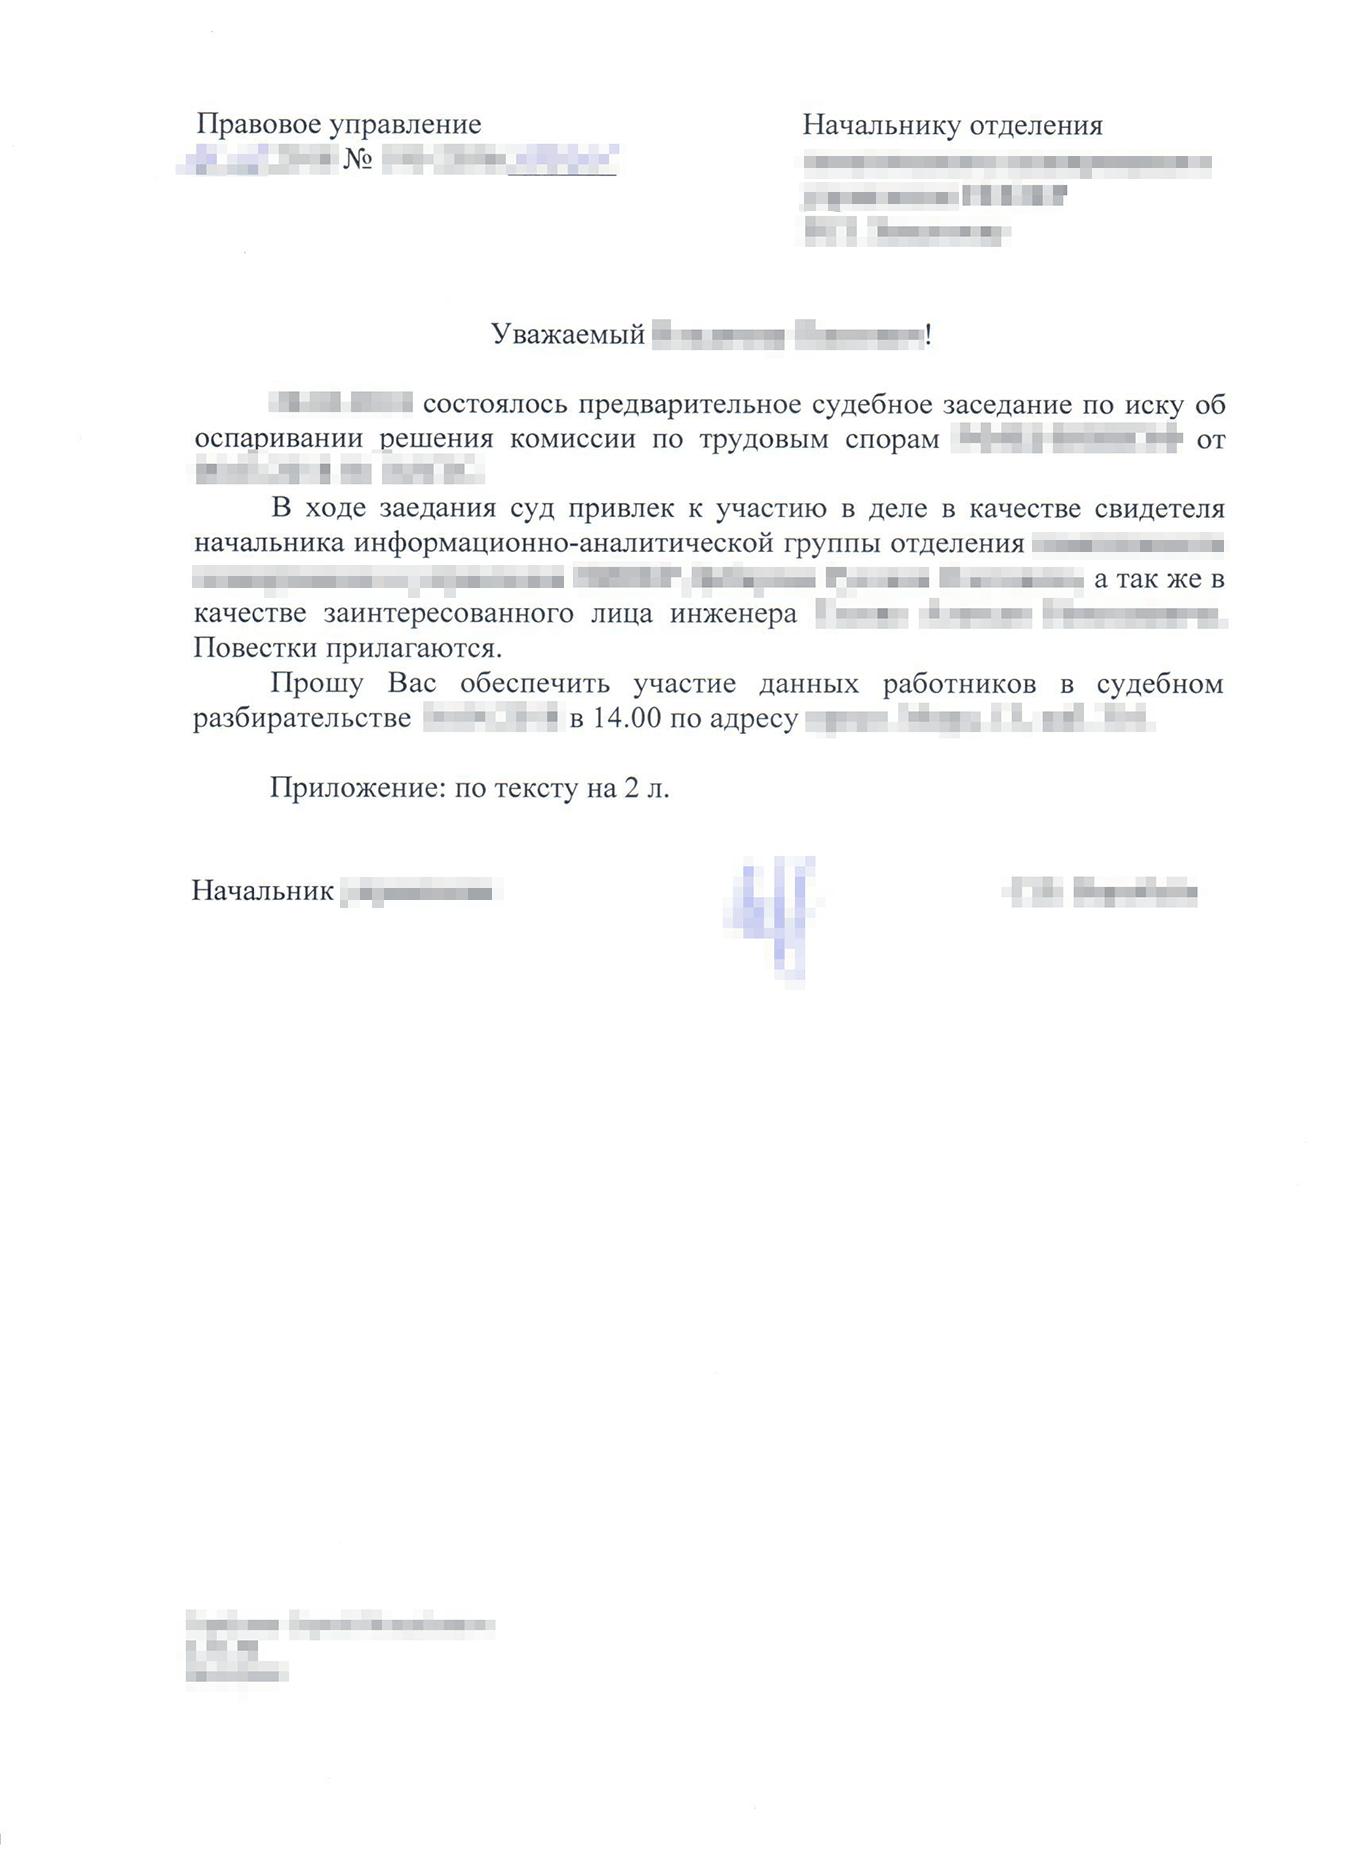 Приглашение в суд от юристов предприятия